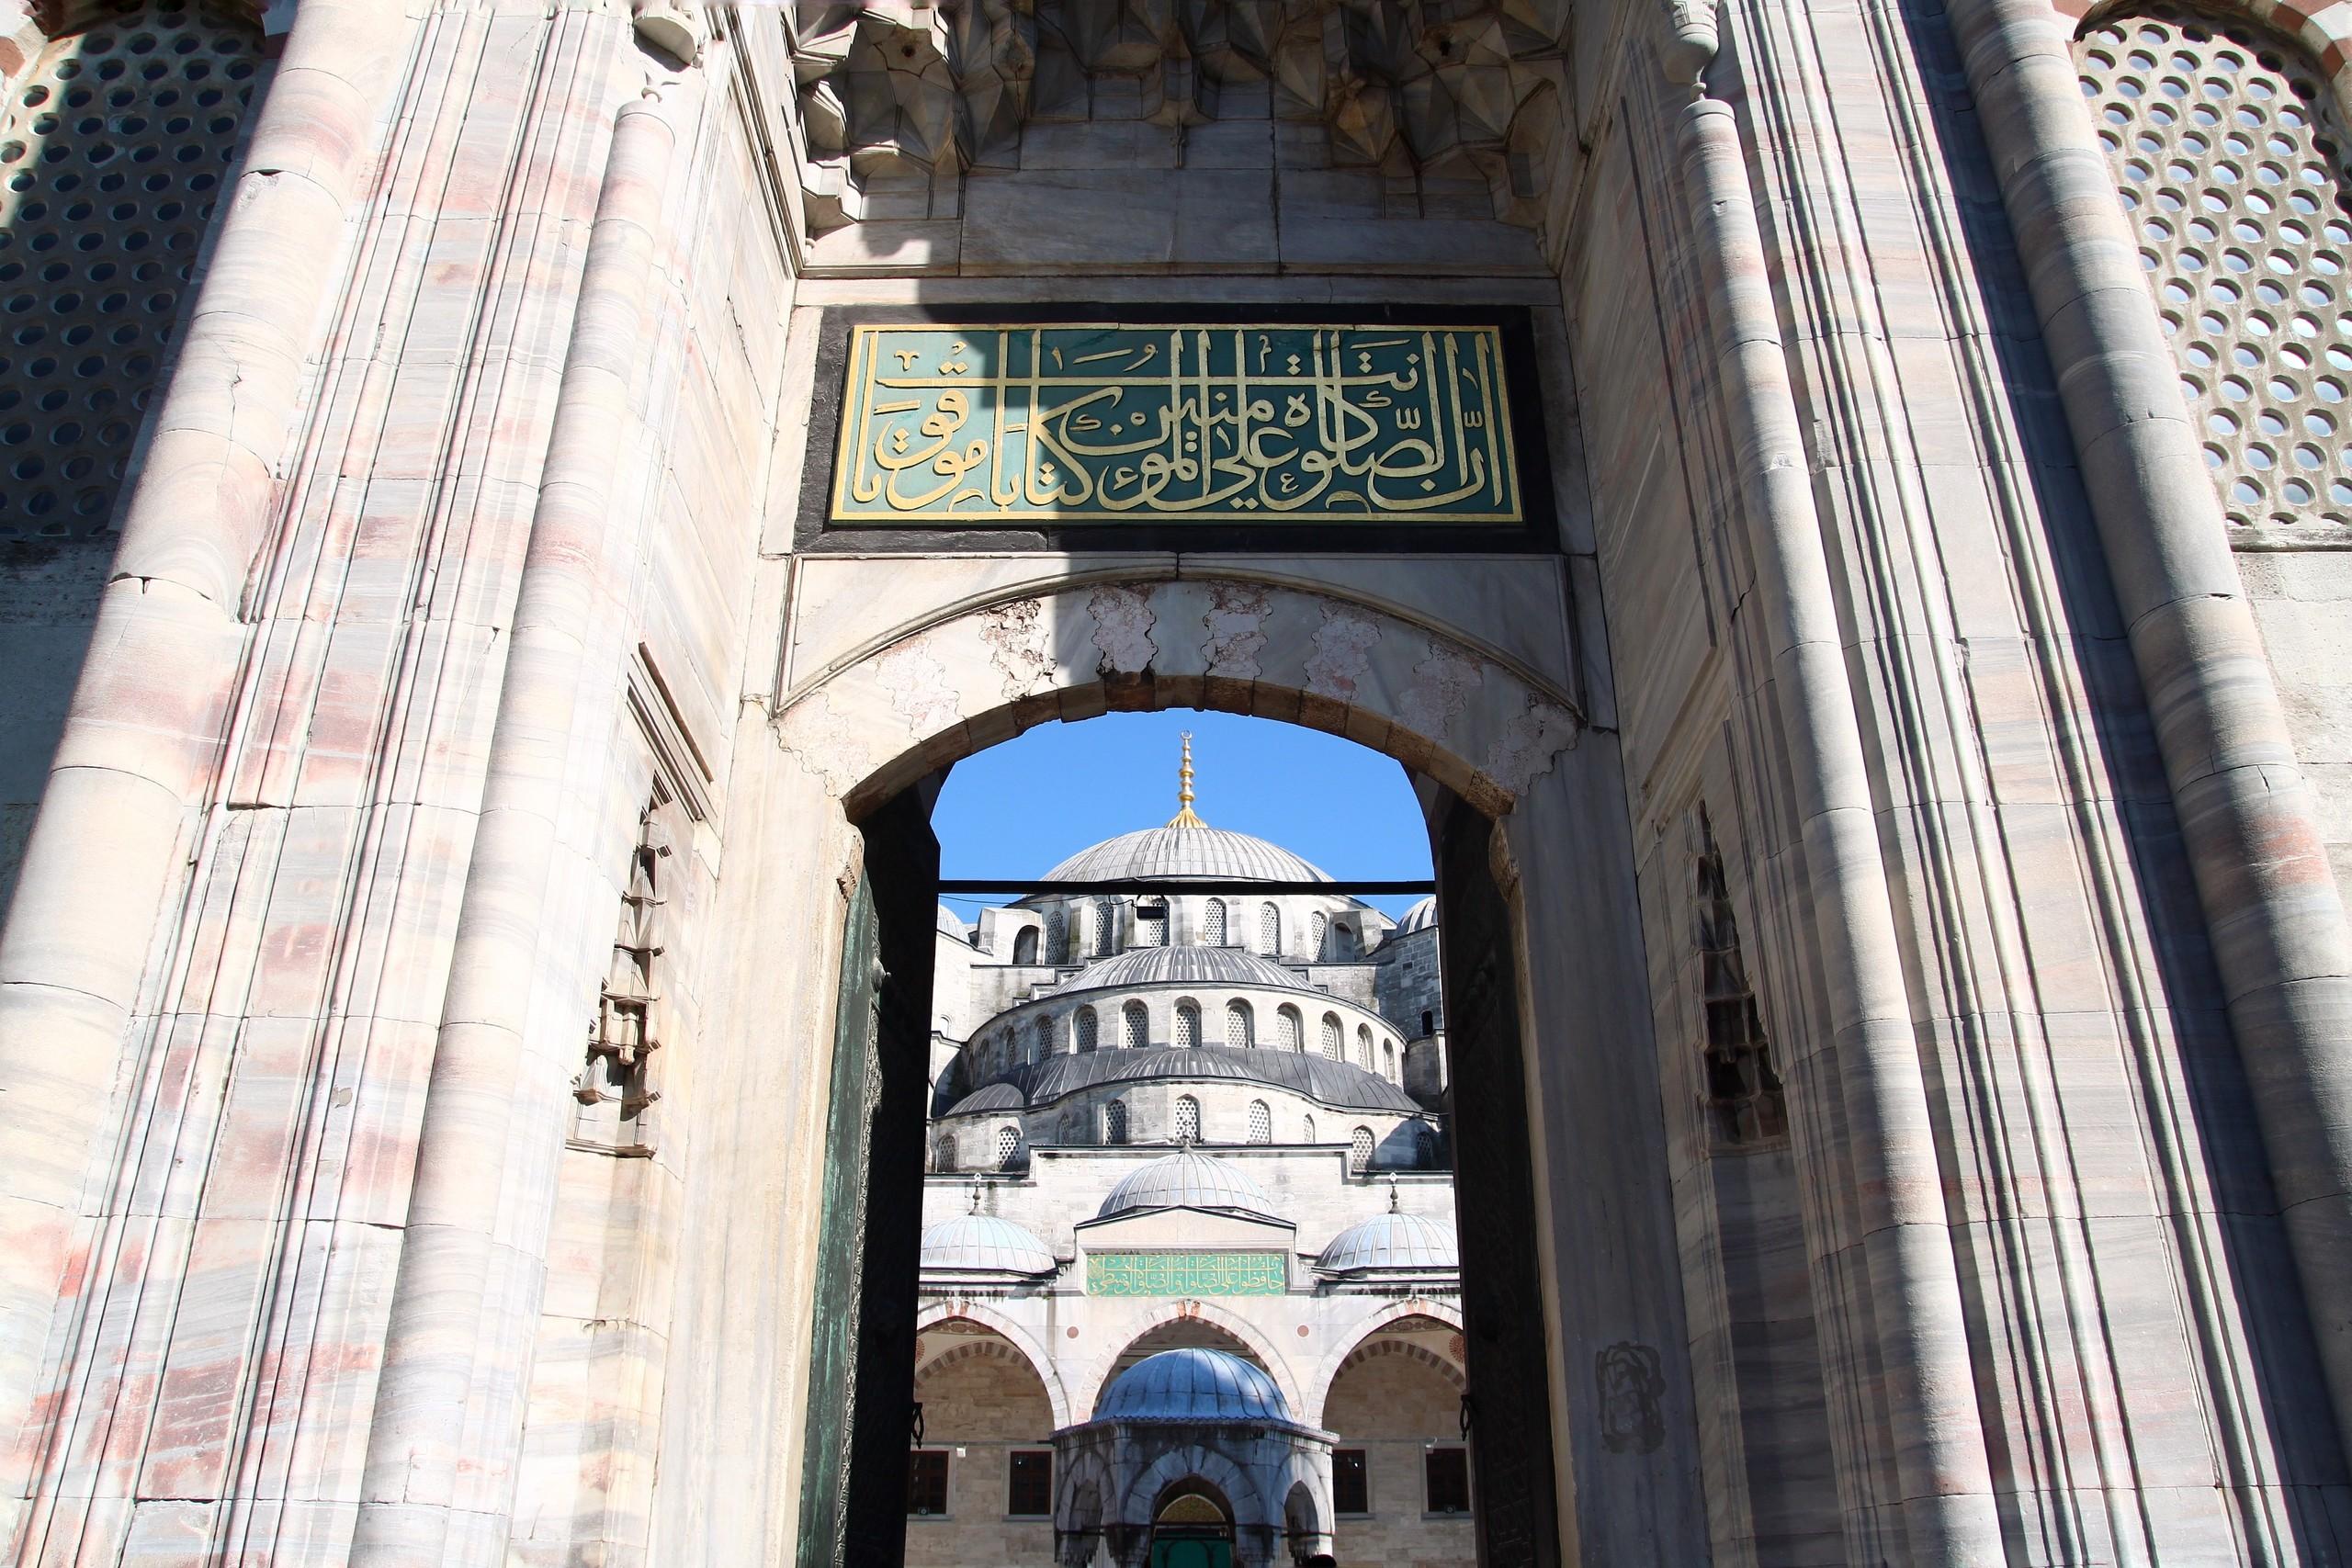 Pırlantadan Kubbeler #5: Sultanahmed - QM89lV - Pırlantadan Kubbeler #5: Sultanahmed